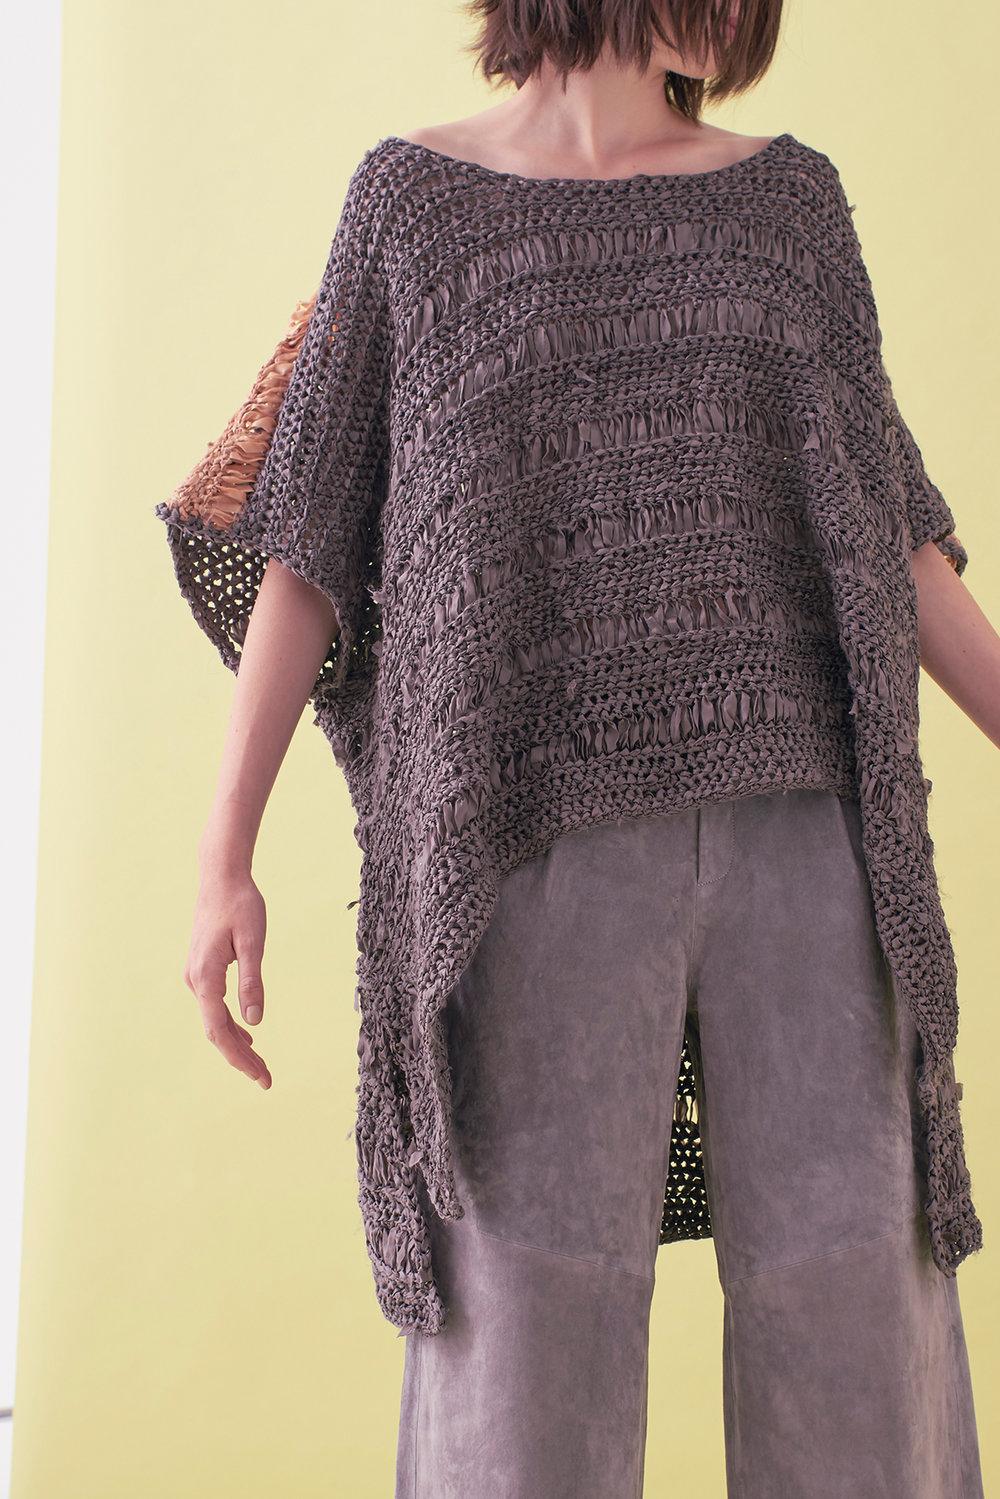 Sarah_Swann_SS17_35_Ribbon_Hand_Crochet_Sweater_F.jpg